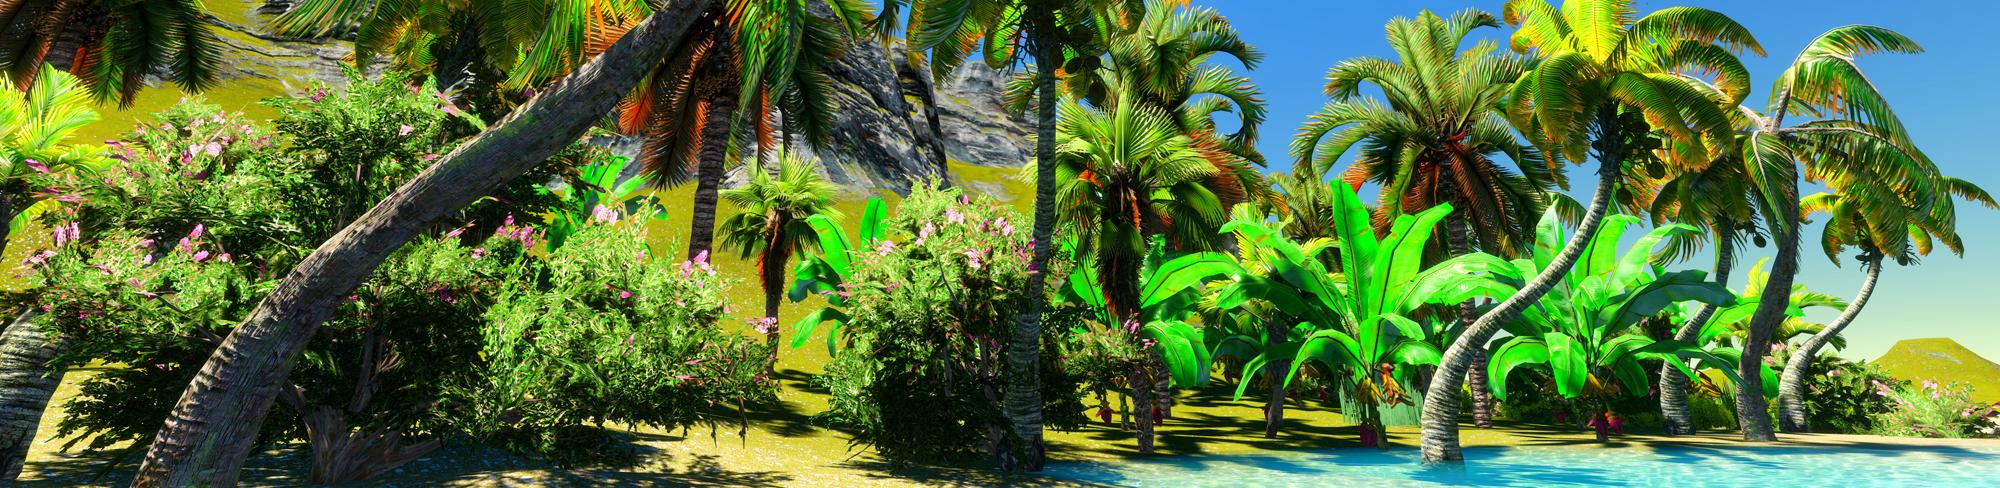 rajska plaża z palmami